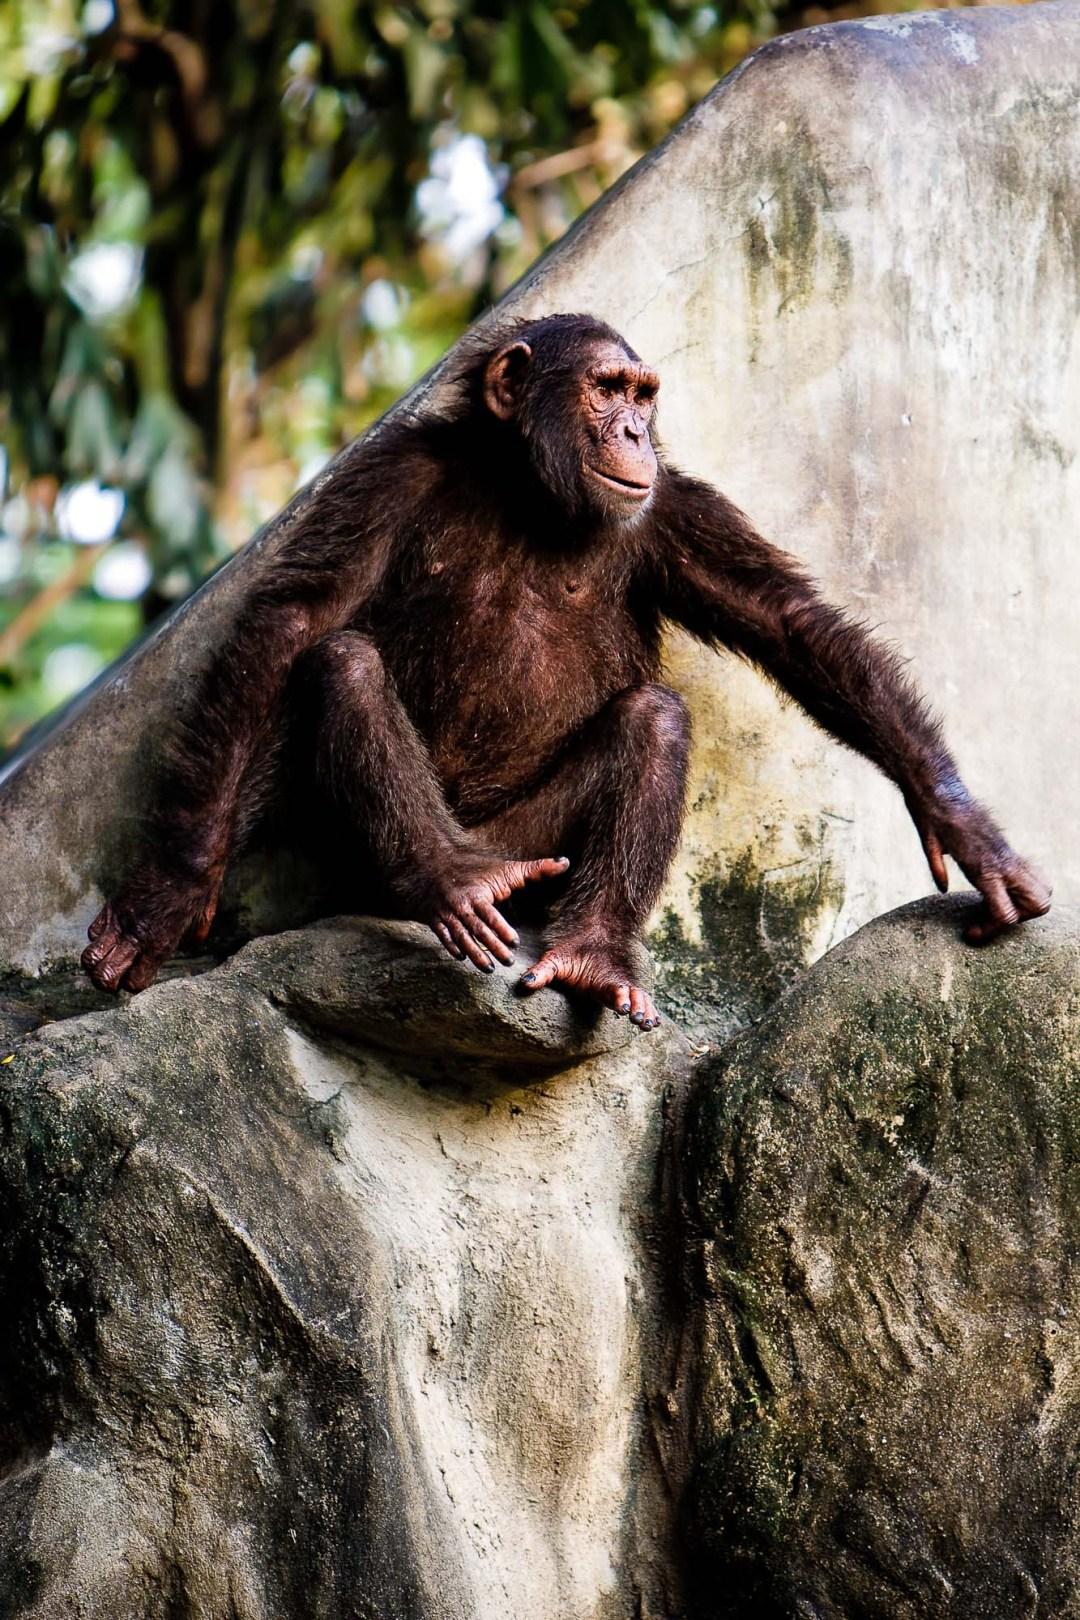 Monkey sitting on a rock | Dusit Zoo Bangkok